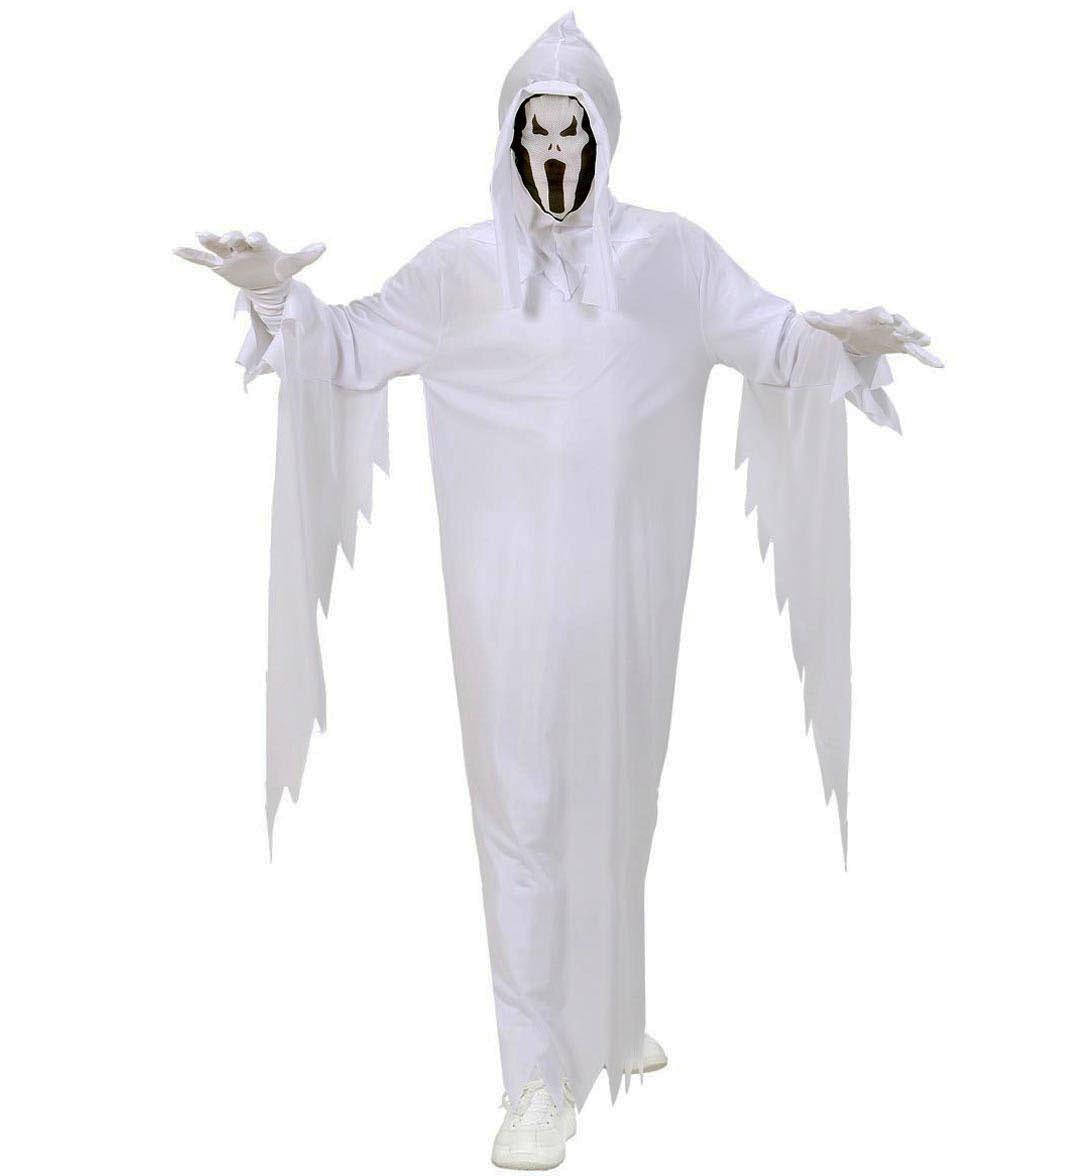 costume enfants tenue robe blanche fant me d guisement halloween 128cm 5 7 ans ebay. Black Bedroom Furniture Sets. Home Design Ideas